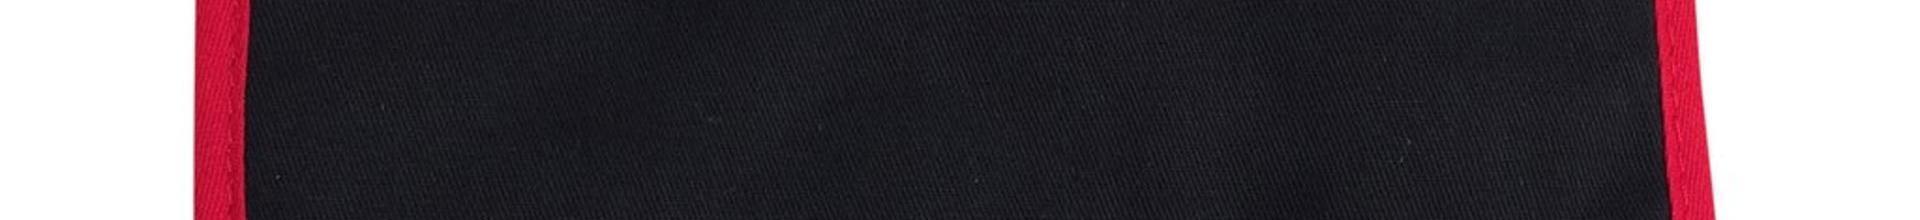 Grillstream Classic Heat Cloth